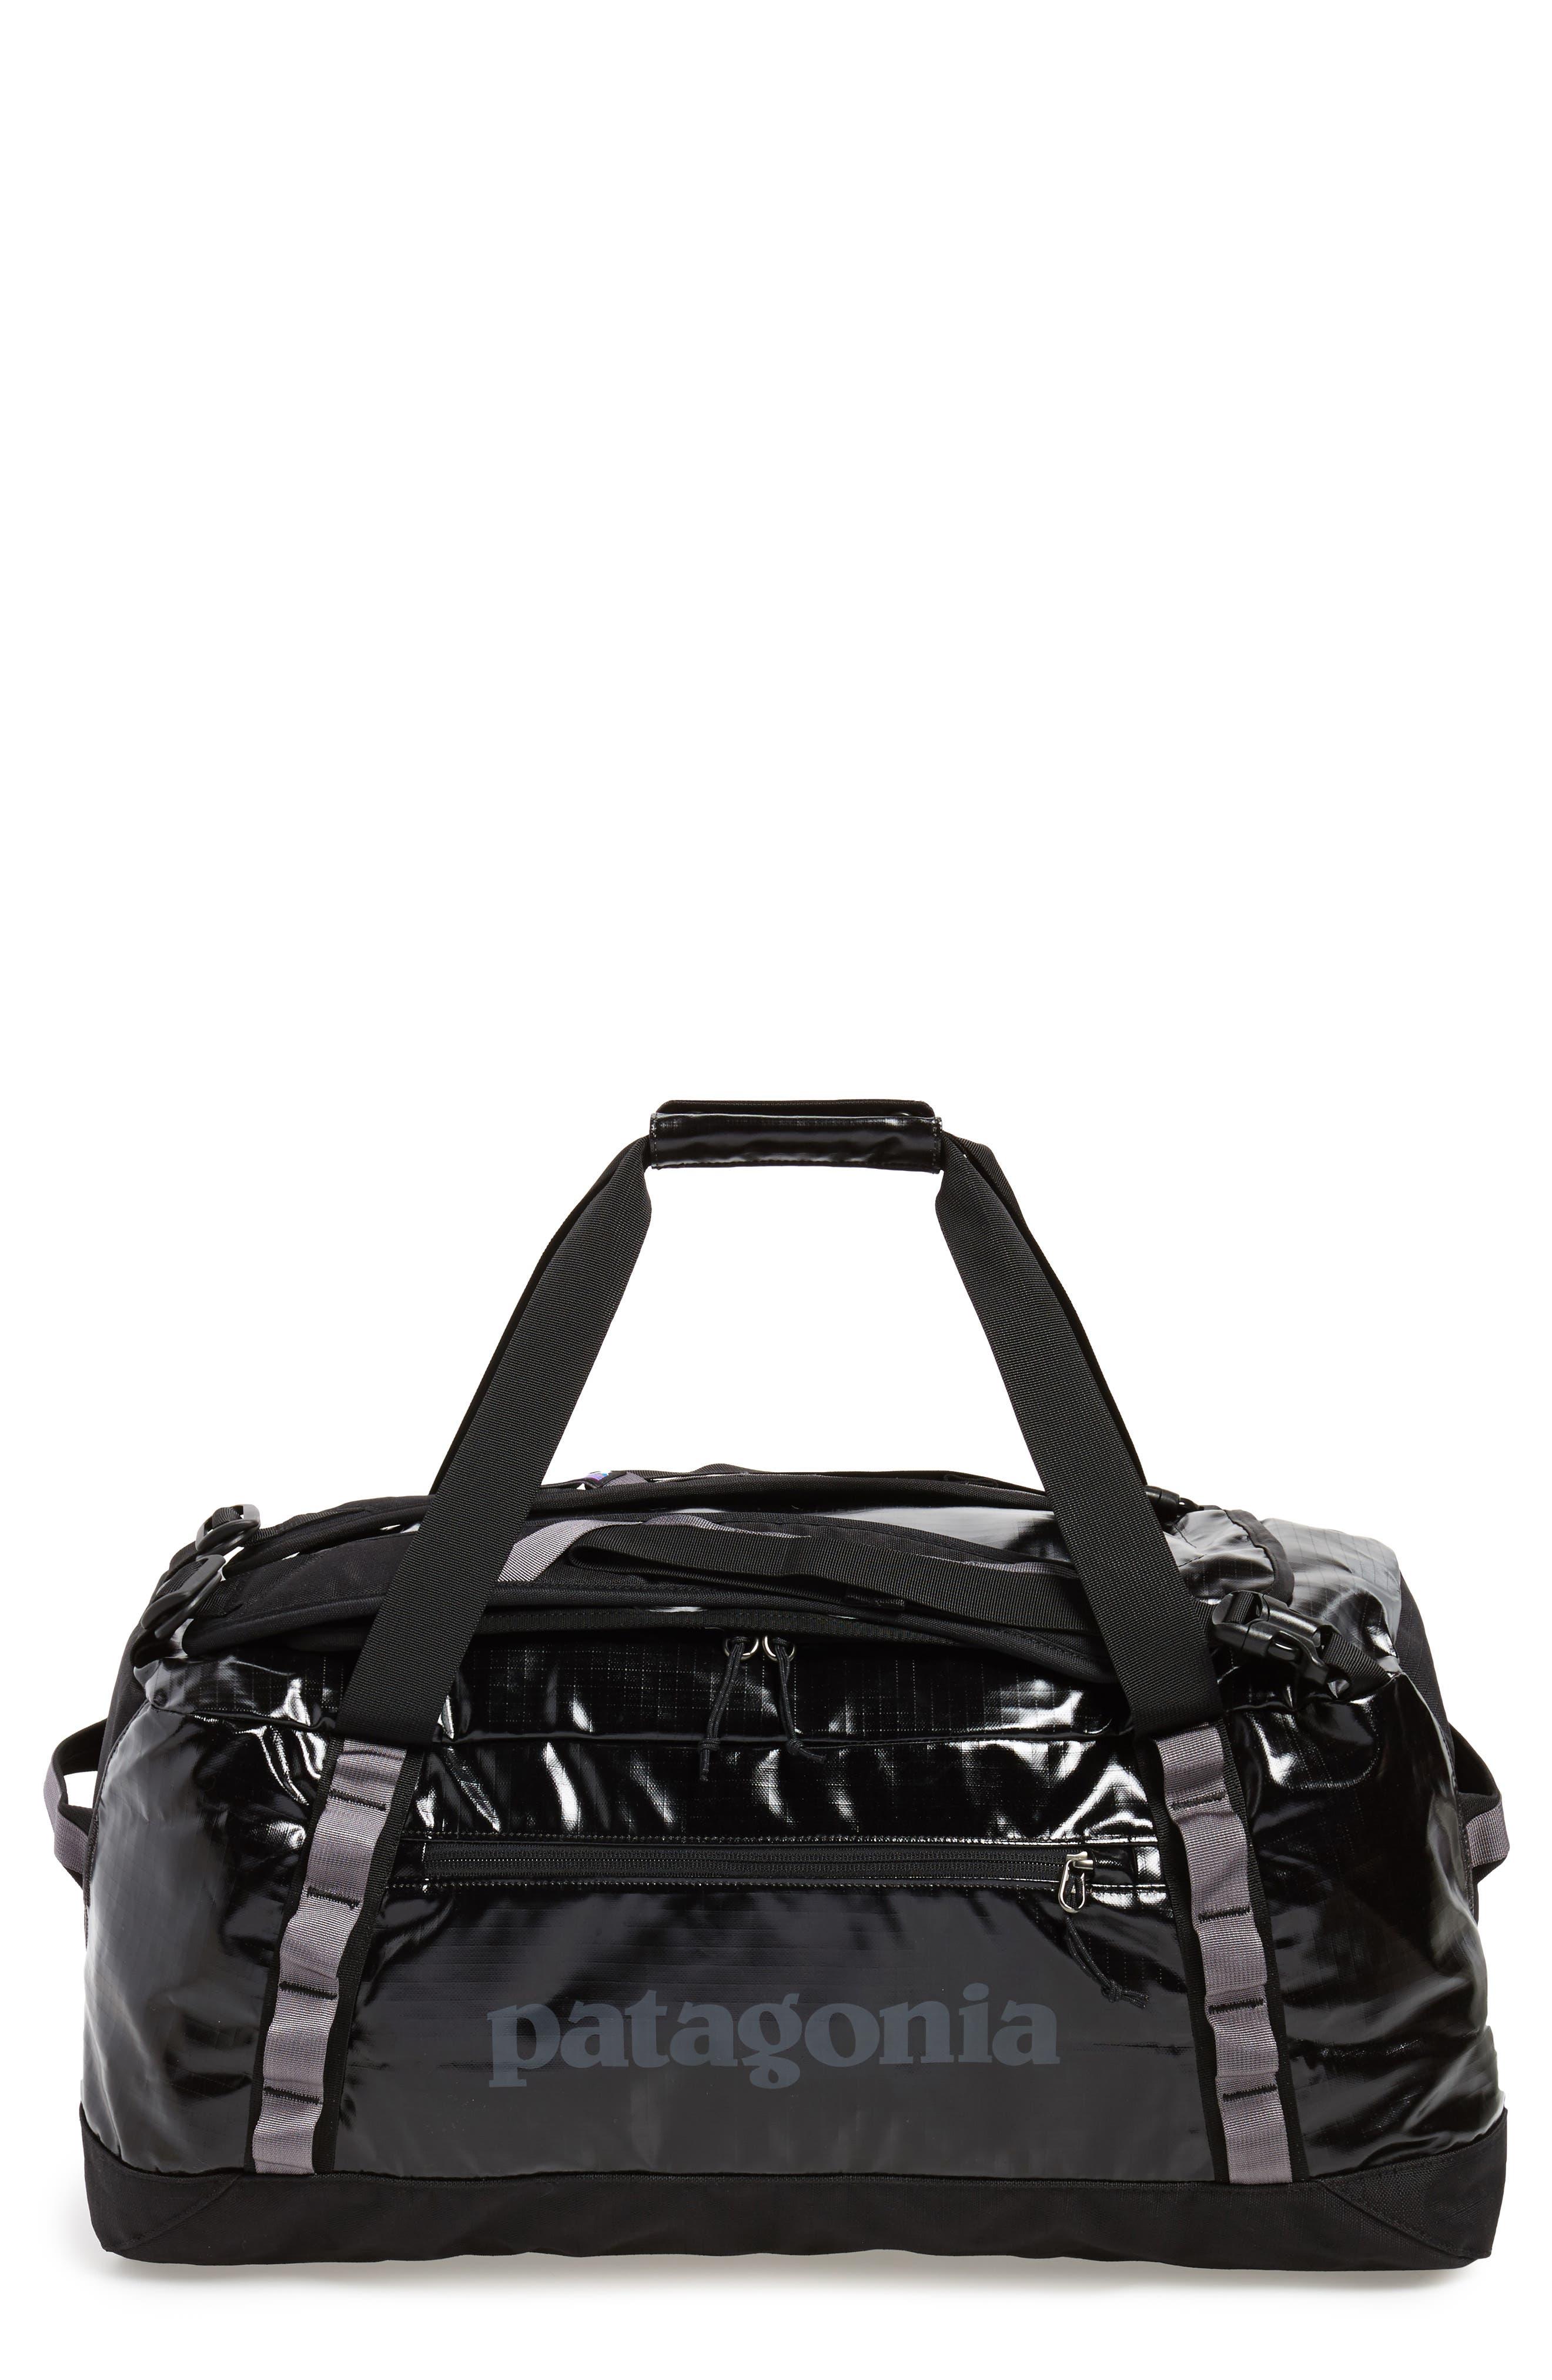 Black Hole Water Repellent Duffel Bag,                             Main thumbnail 1, color,                             Black